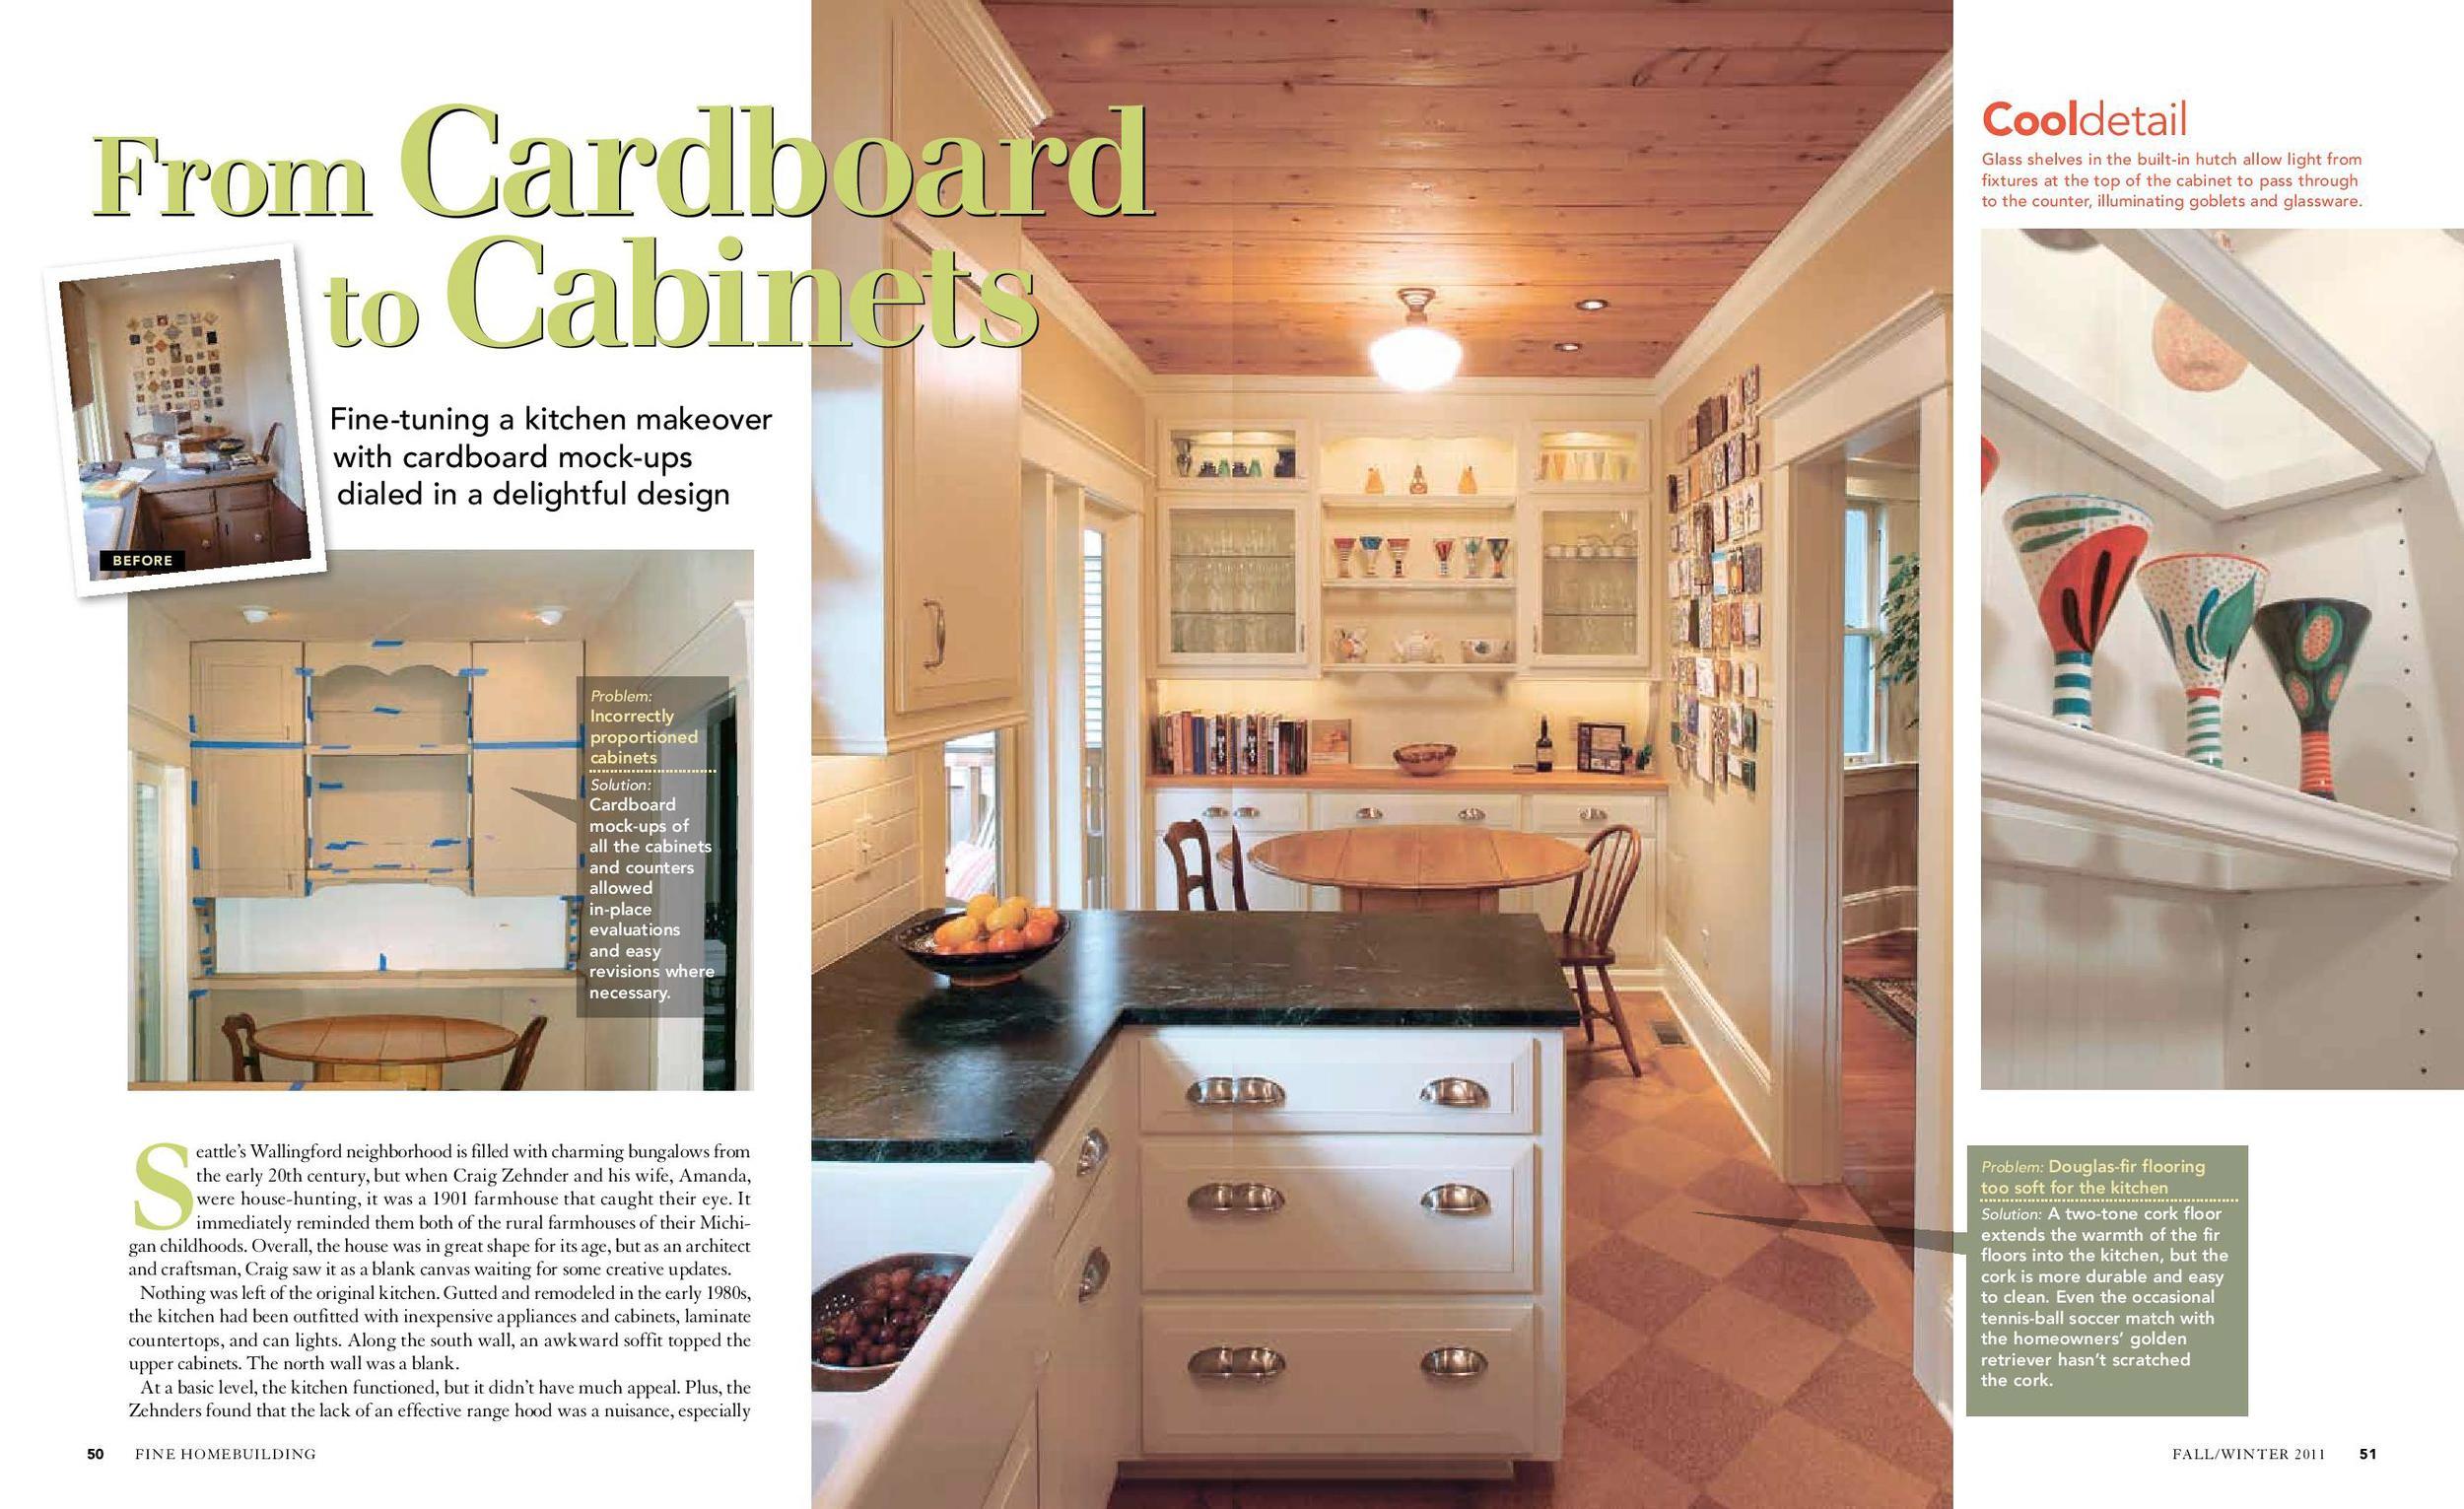 Fine+Homebuilding+Article+-+Final+PDF-page-001.jpg